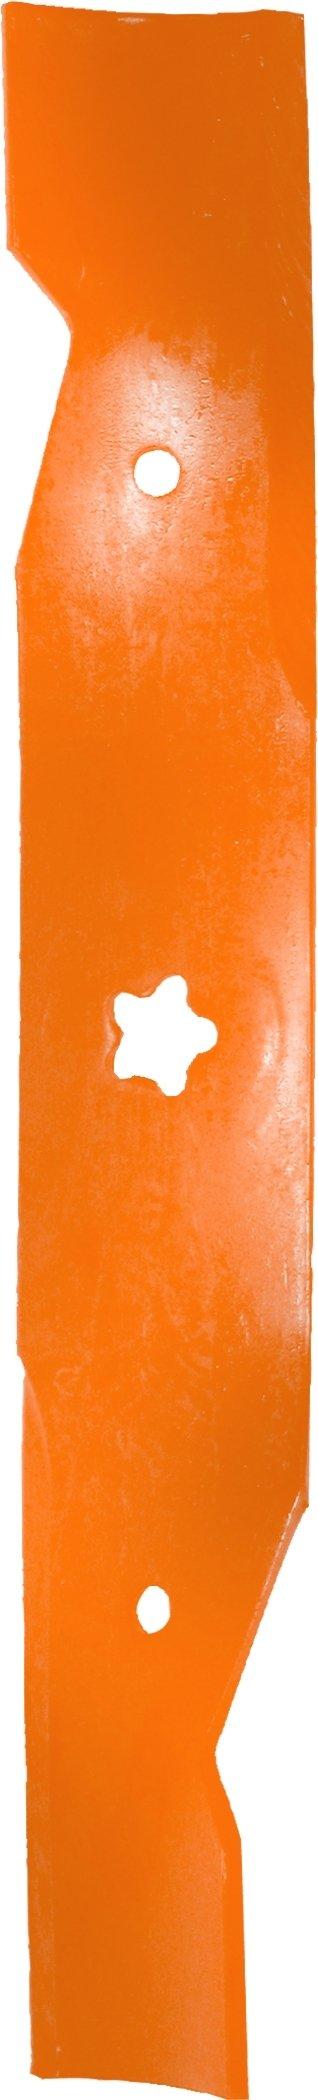 Husqvarna HU22027 48-Inch Premium Hi-Lift Bagging Blade, 3-Pack, Orange by Husqvarna